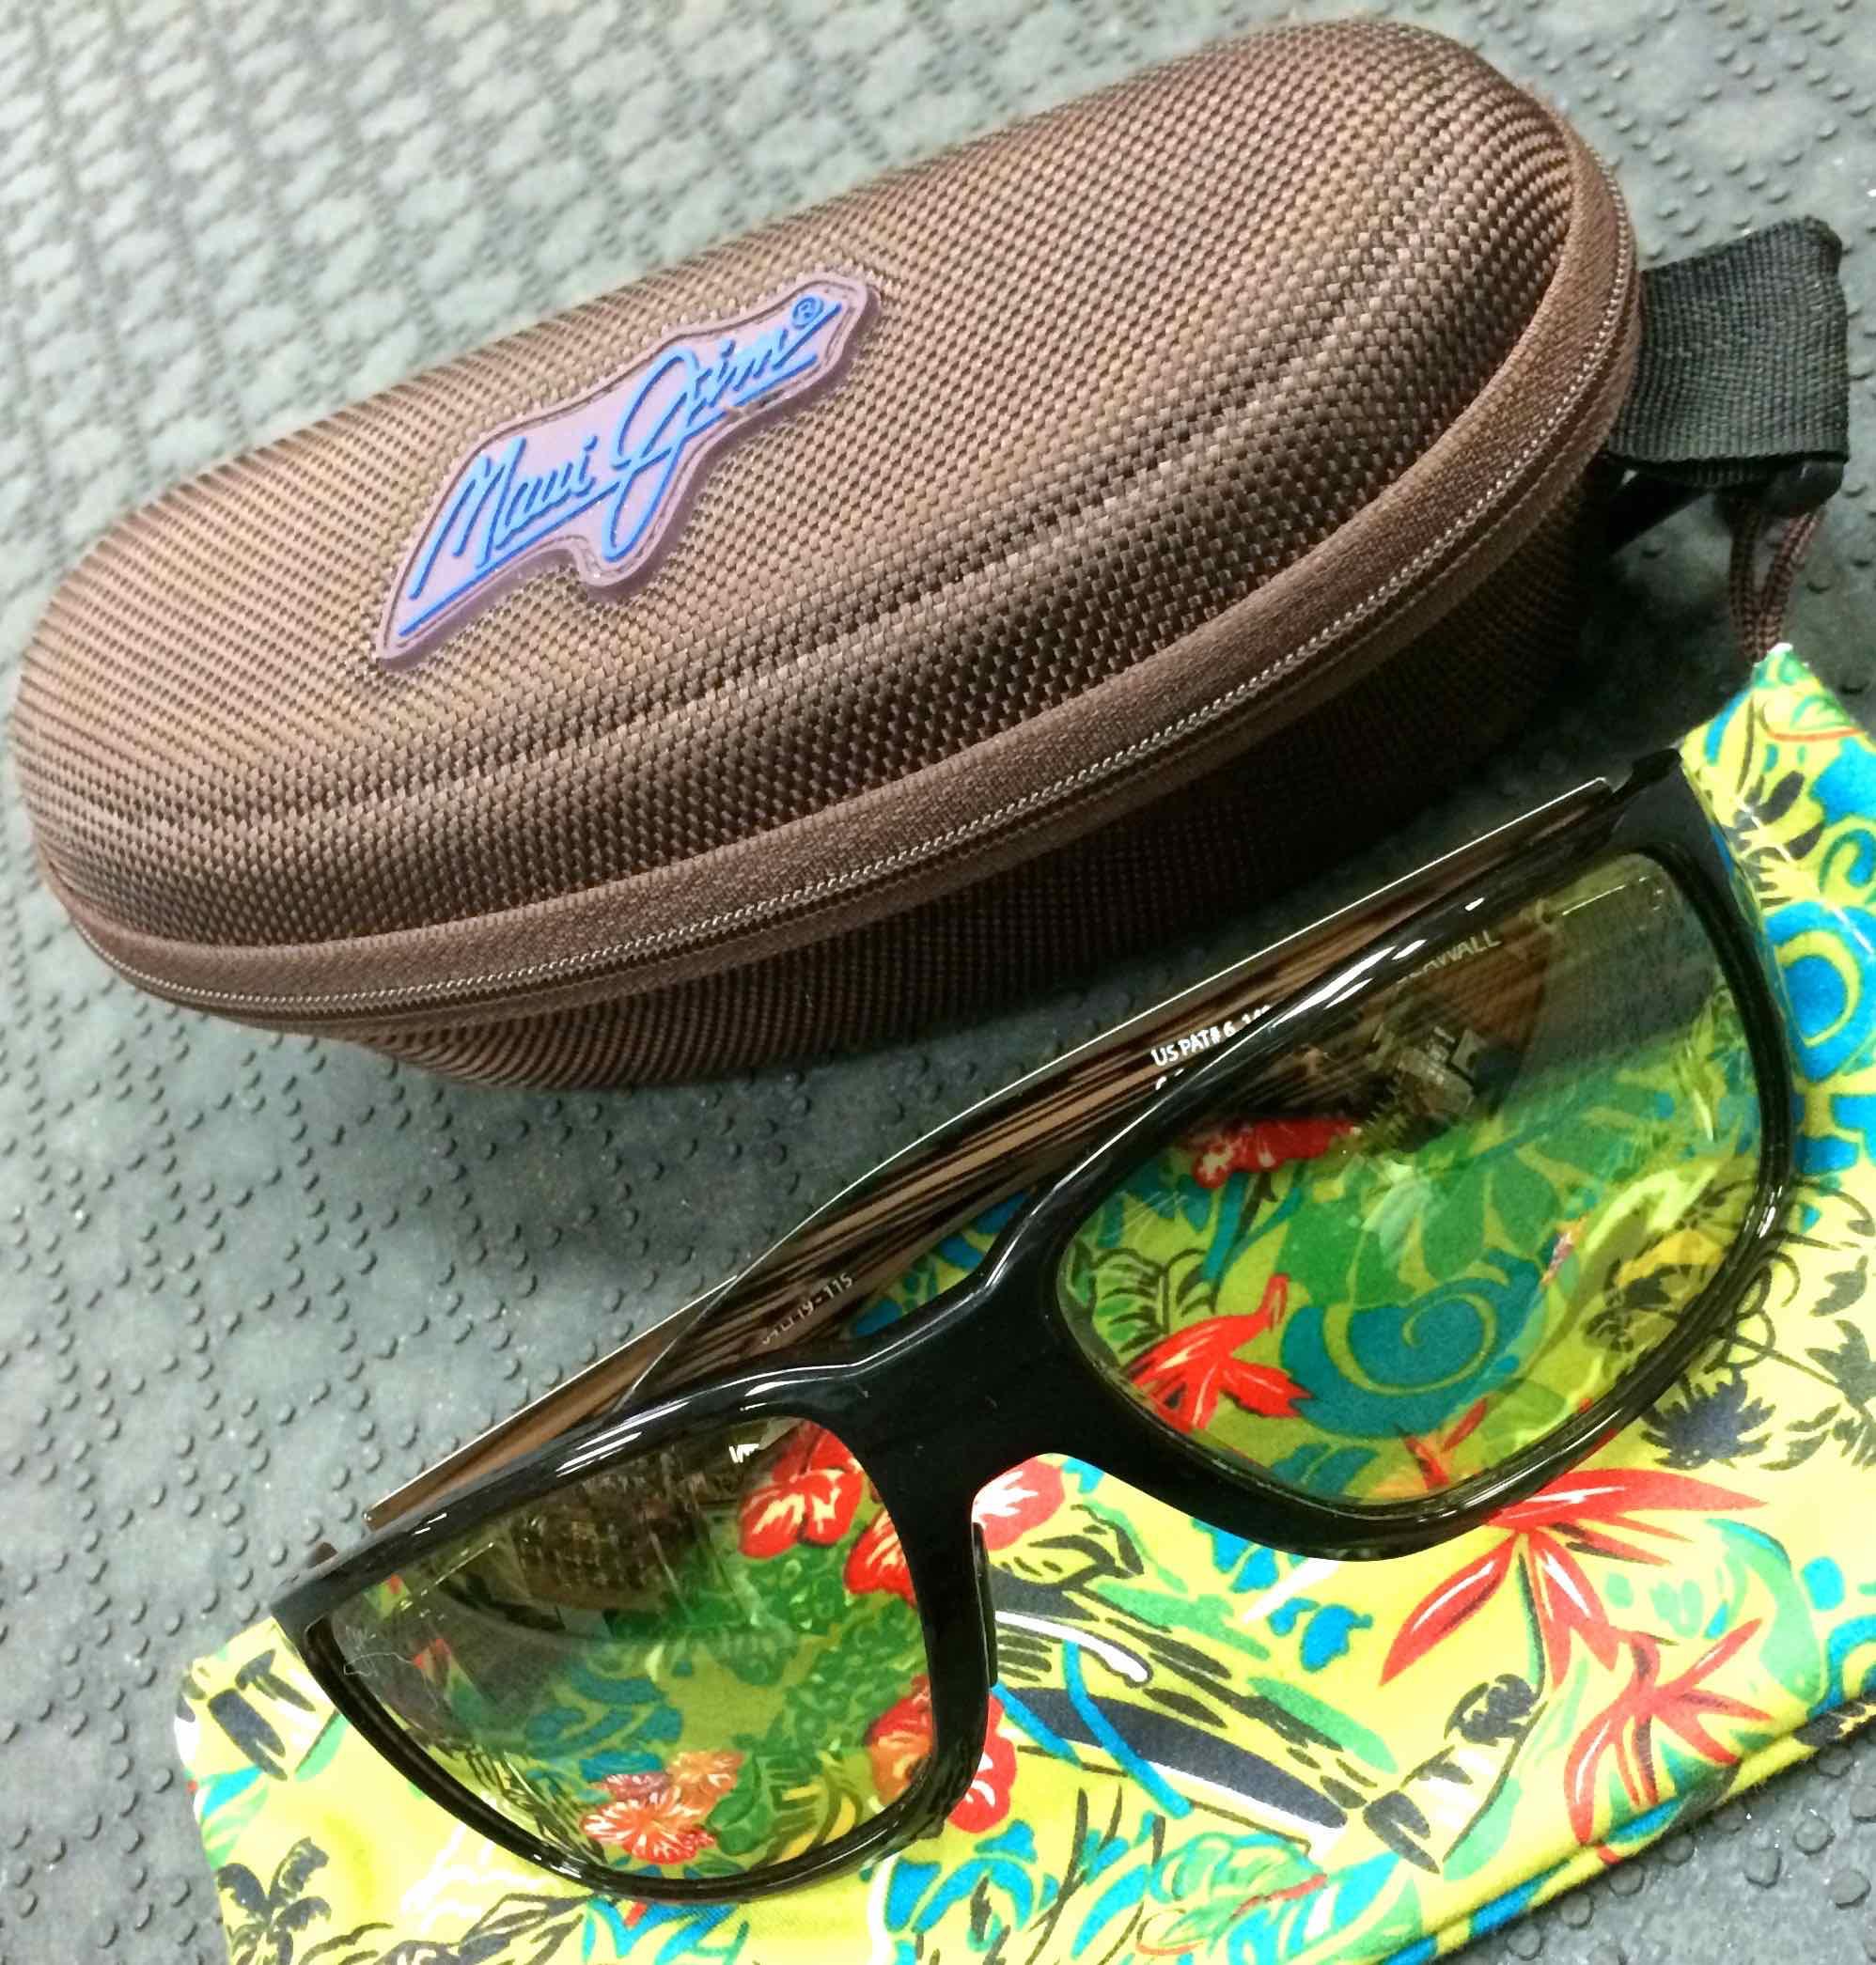 Sold maui jim seawall polarized sunglasses like for Fly fishing maui